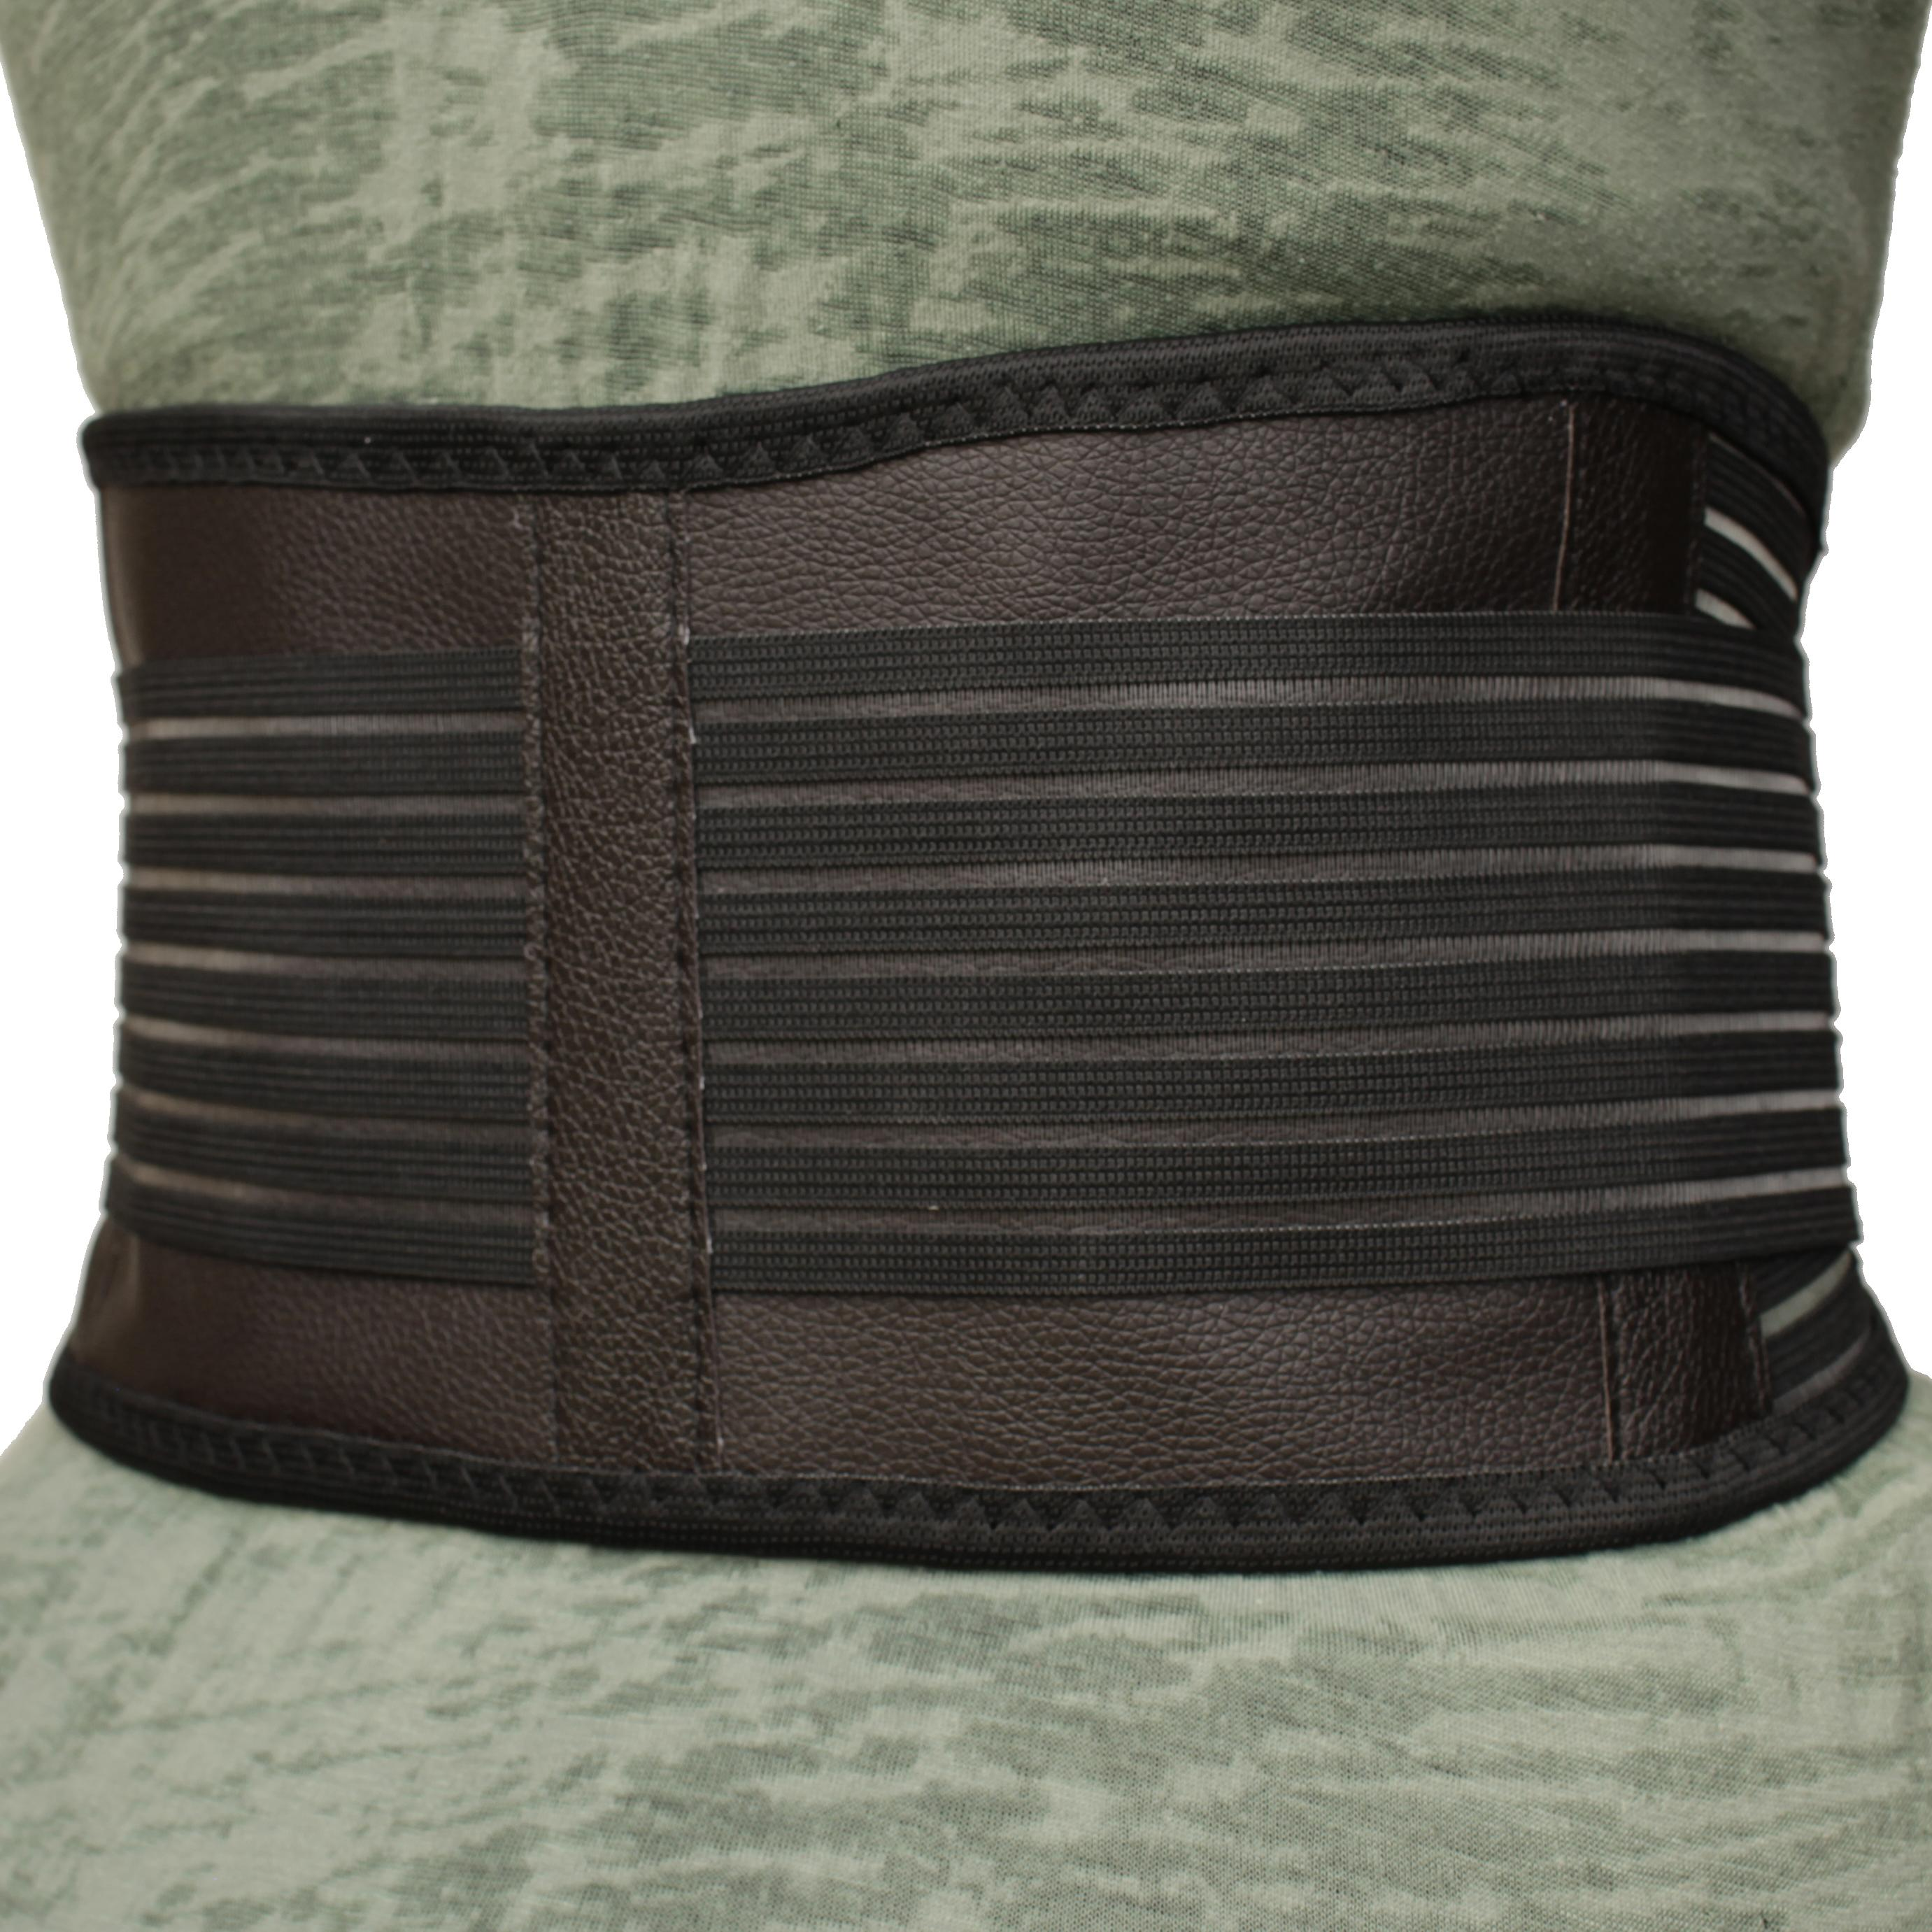 Self-Heating Back Support | Magnets & Tourmaline | Adjustable Fit